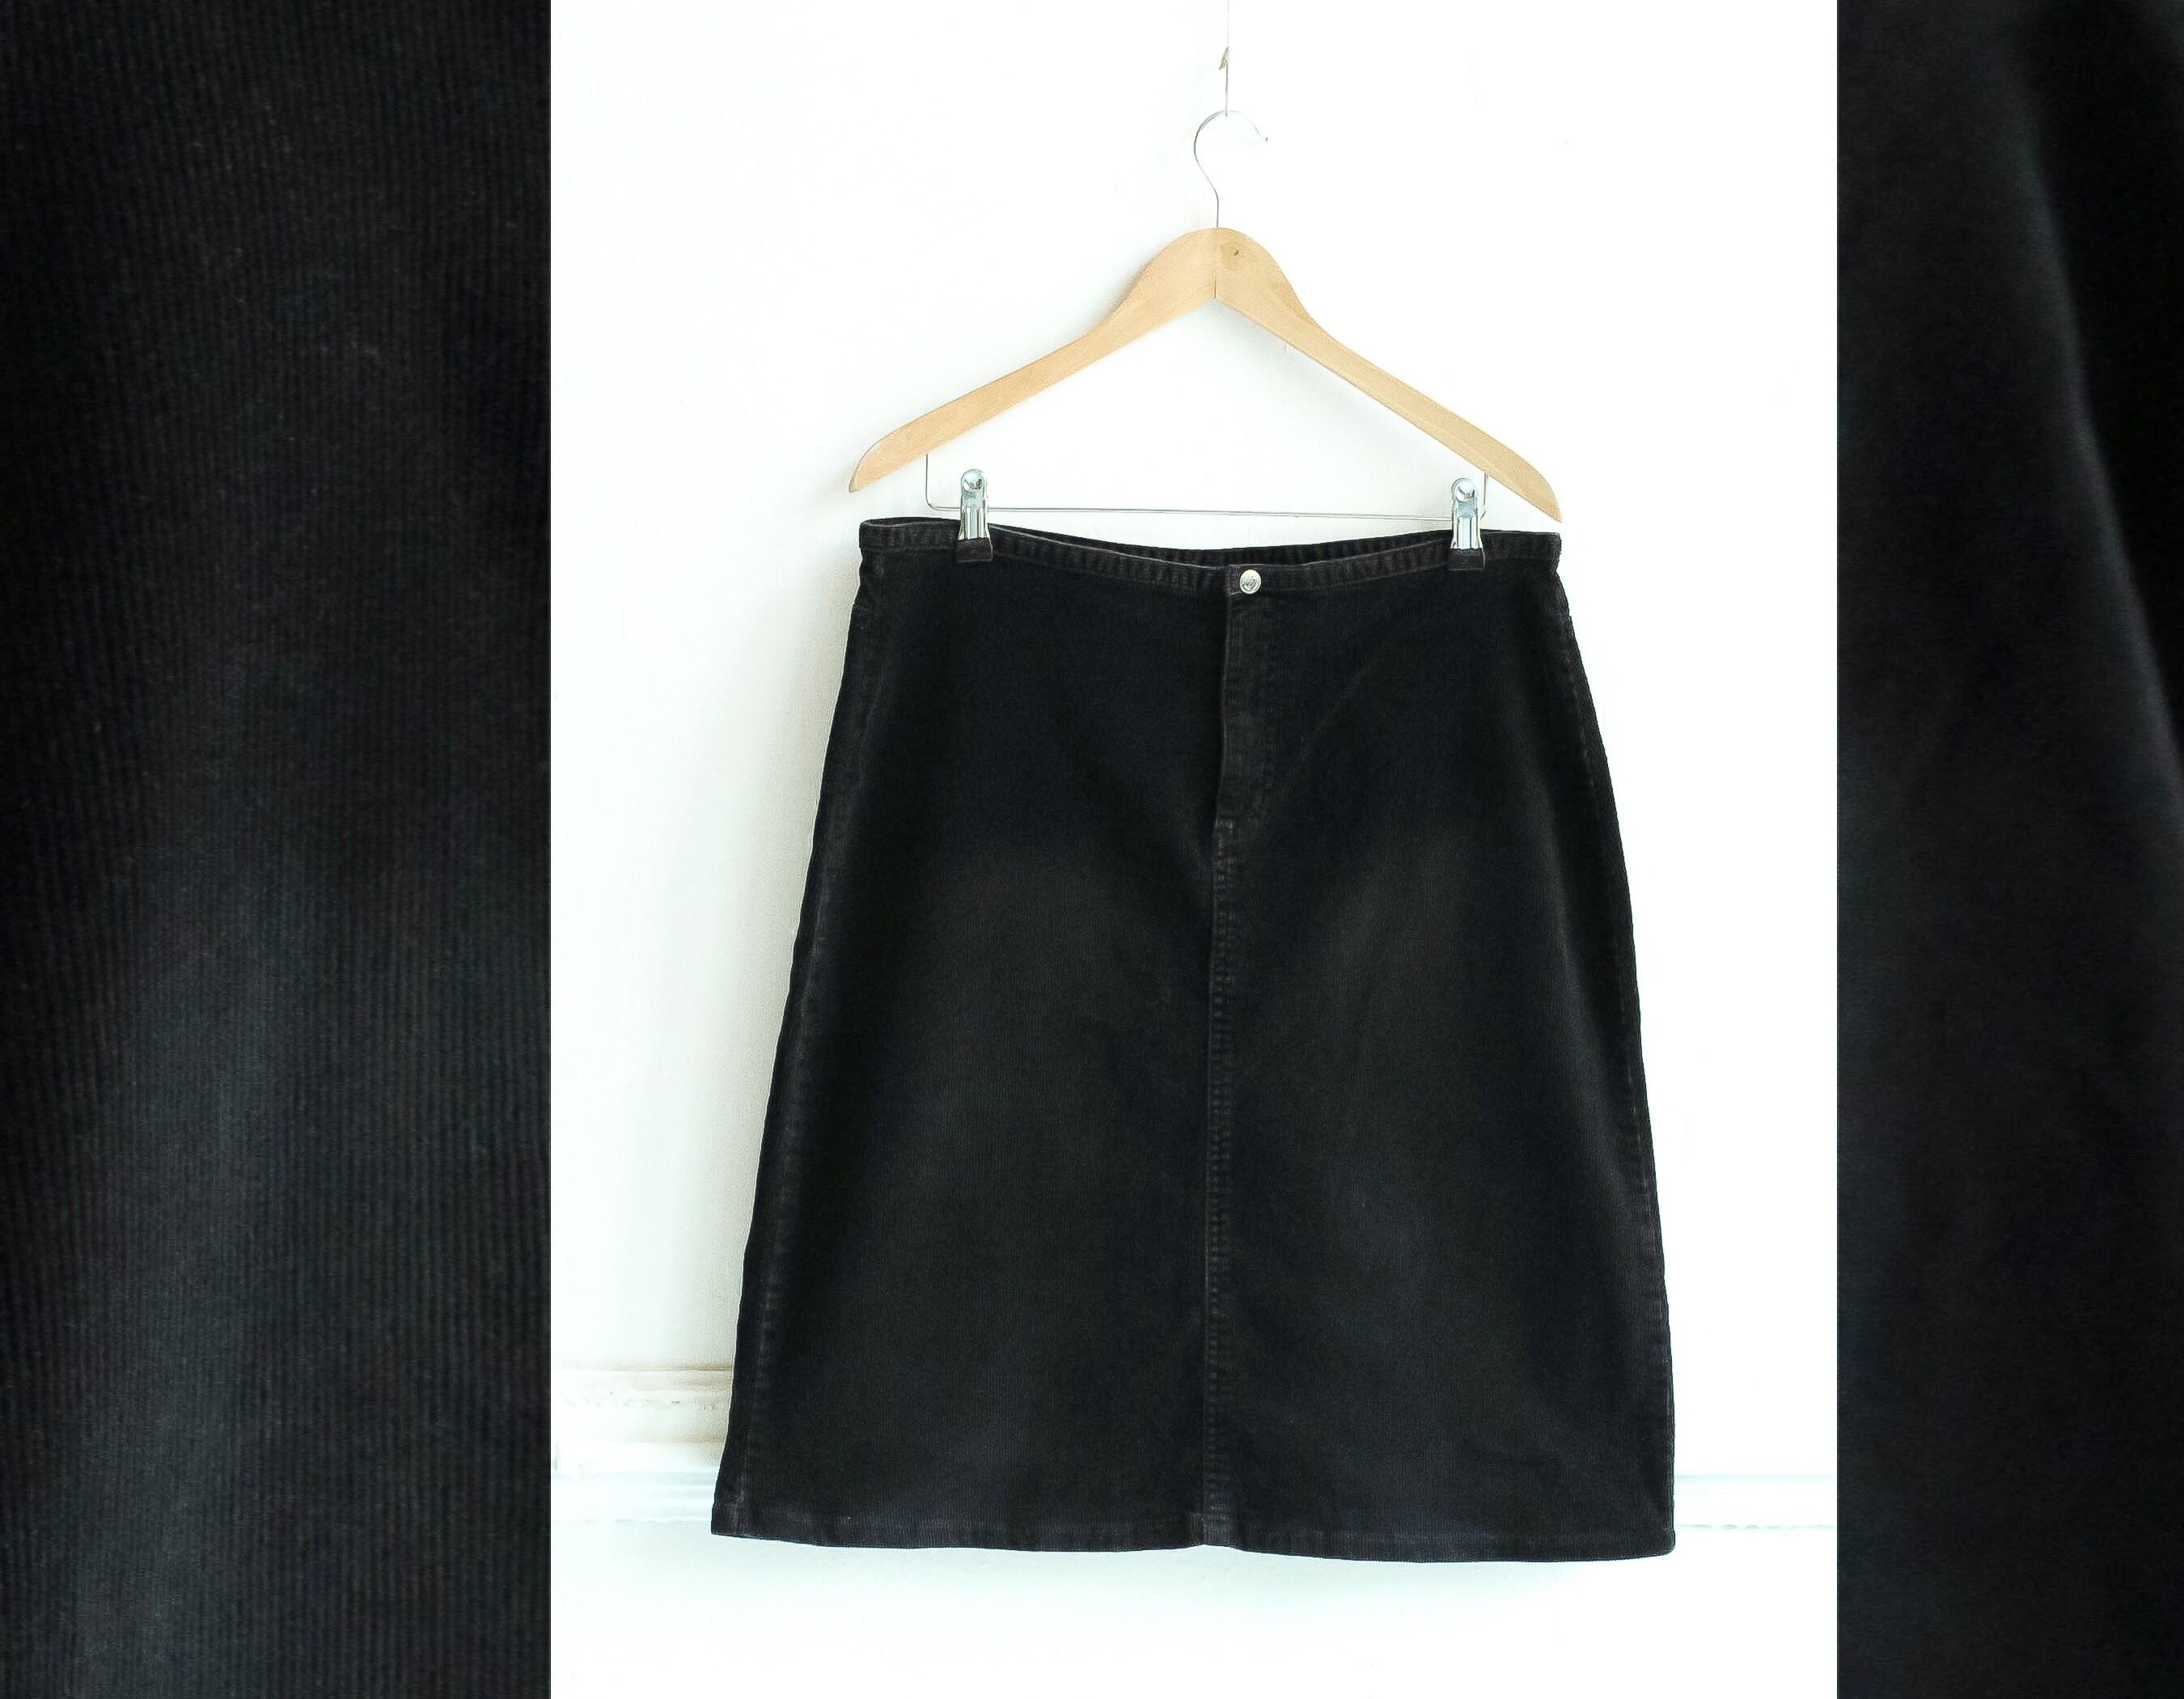 2c9adbdb8e Amazon.co.uk: cord skirt: Clothing. Womens ...